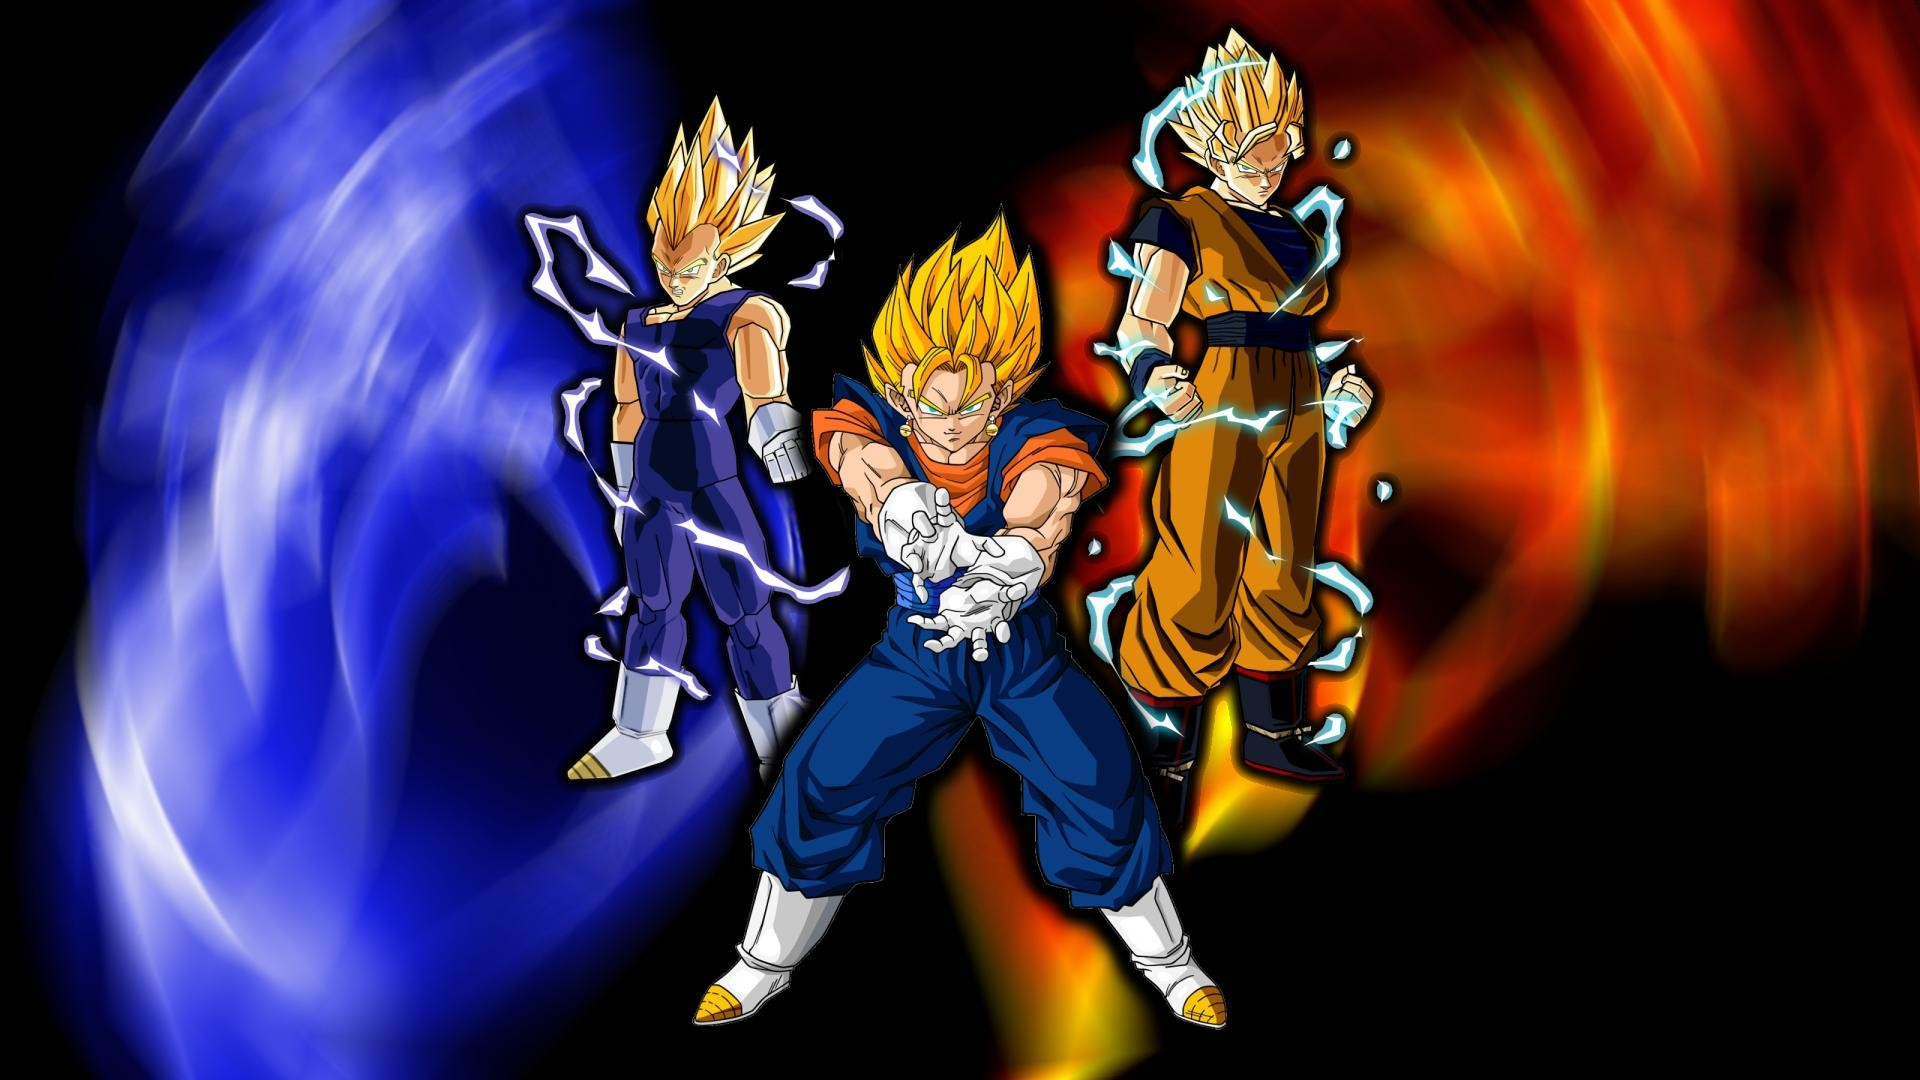 Dragon Ball Z Goku iPhone Wallpaper